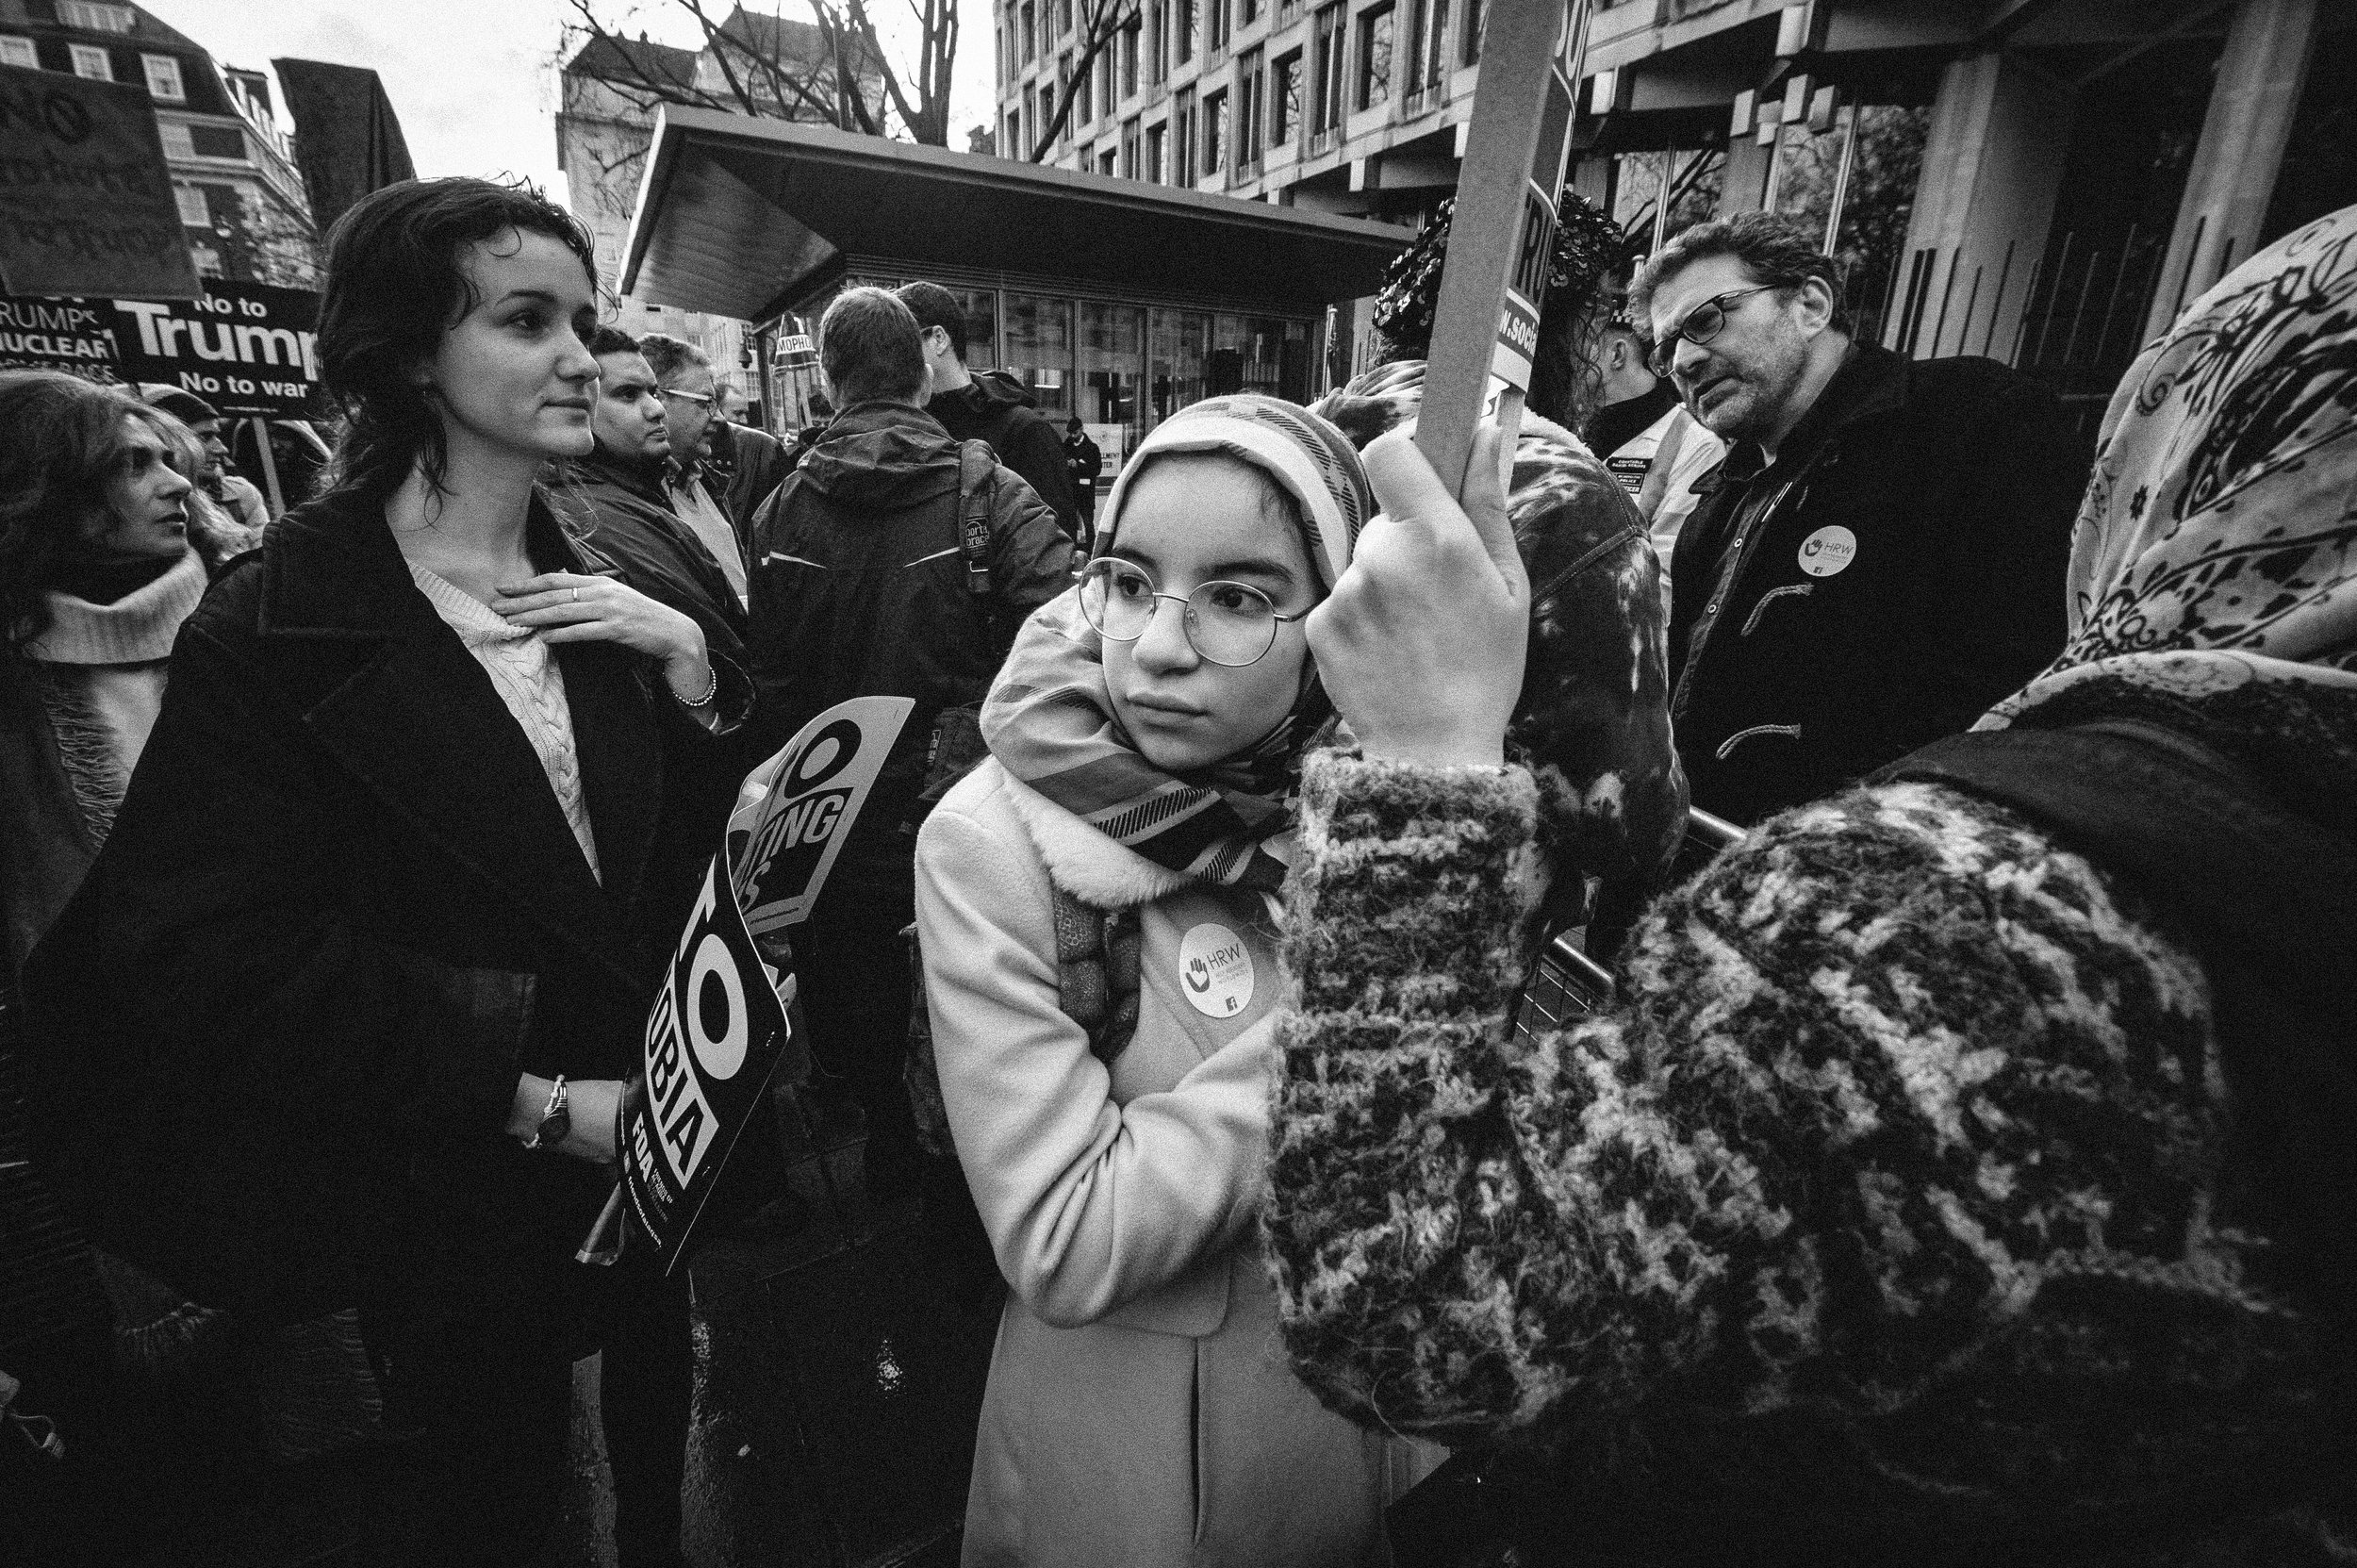 Muslim Ban Protest 040217-12.jpg